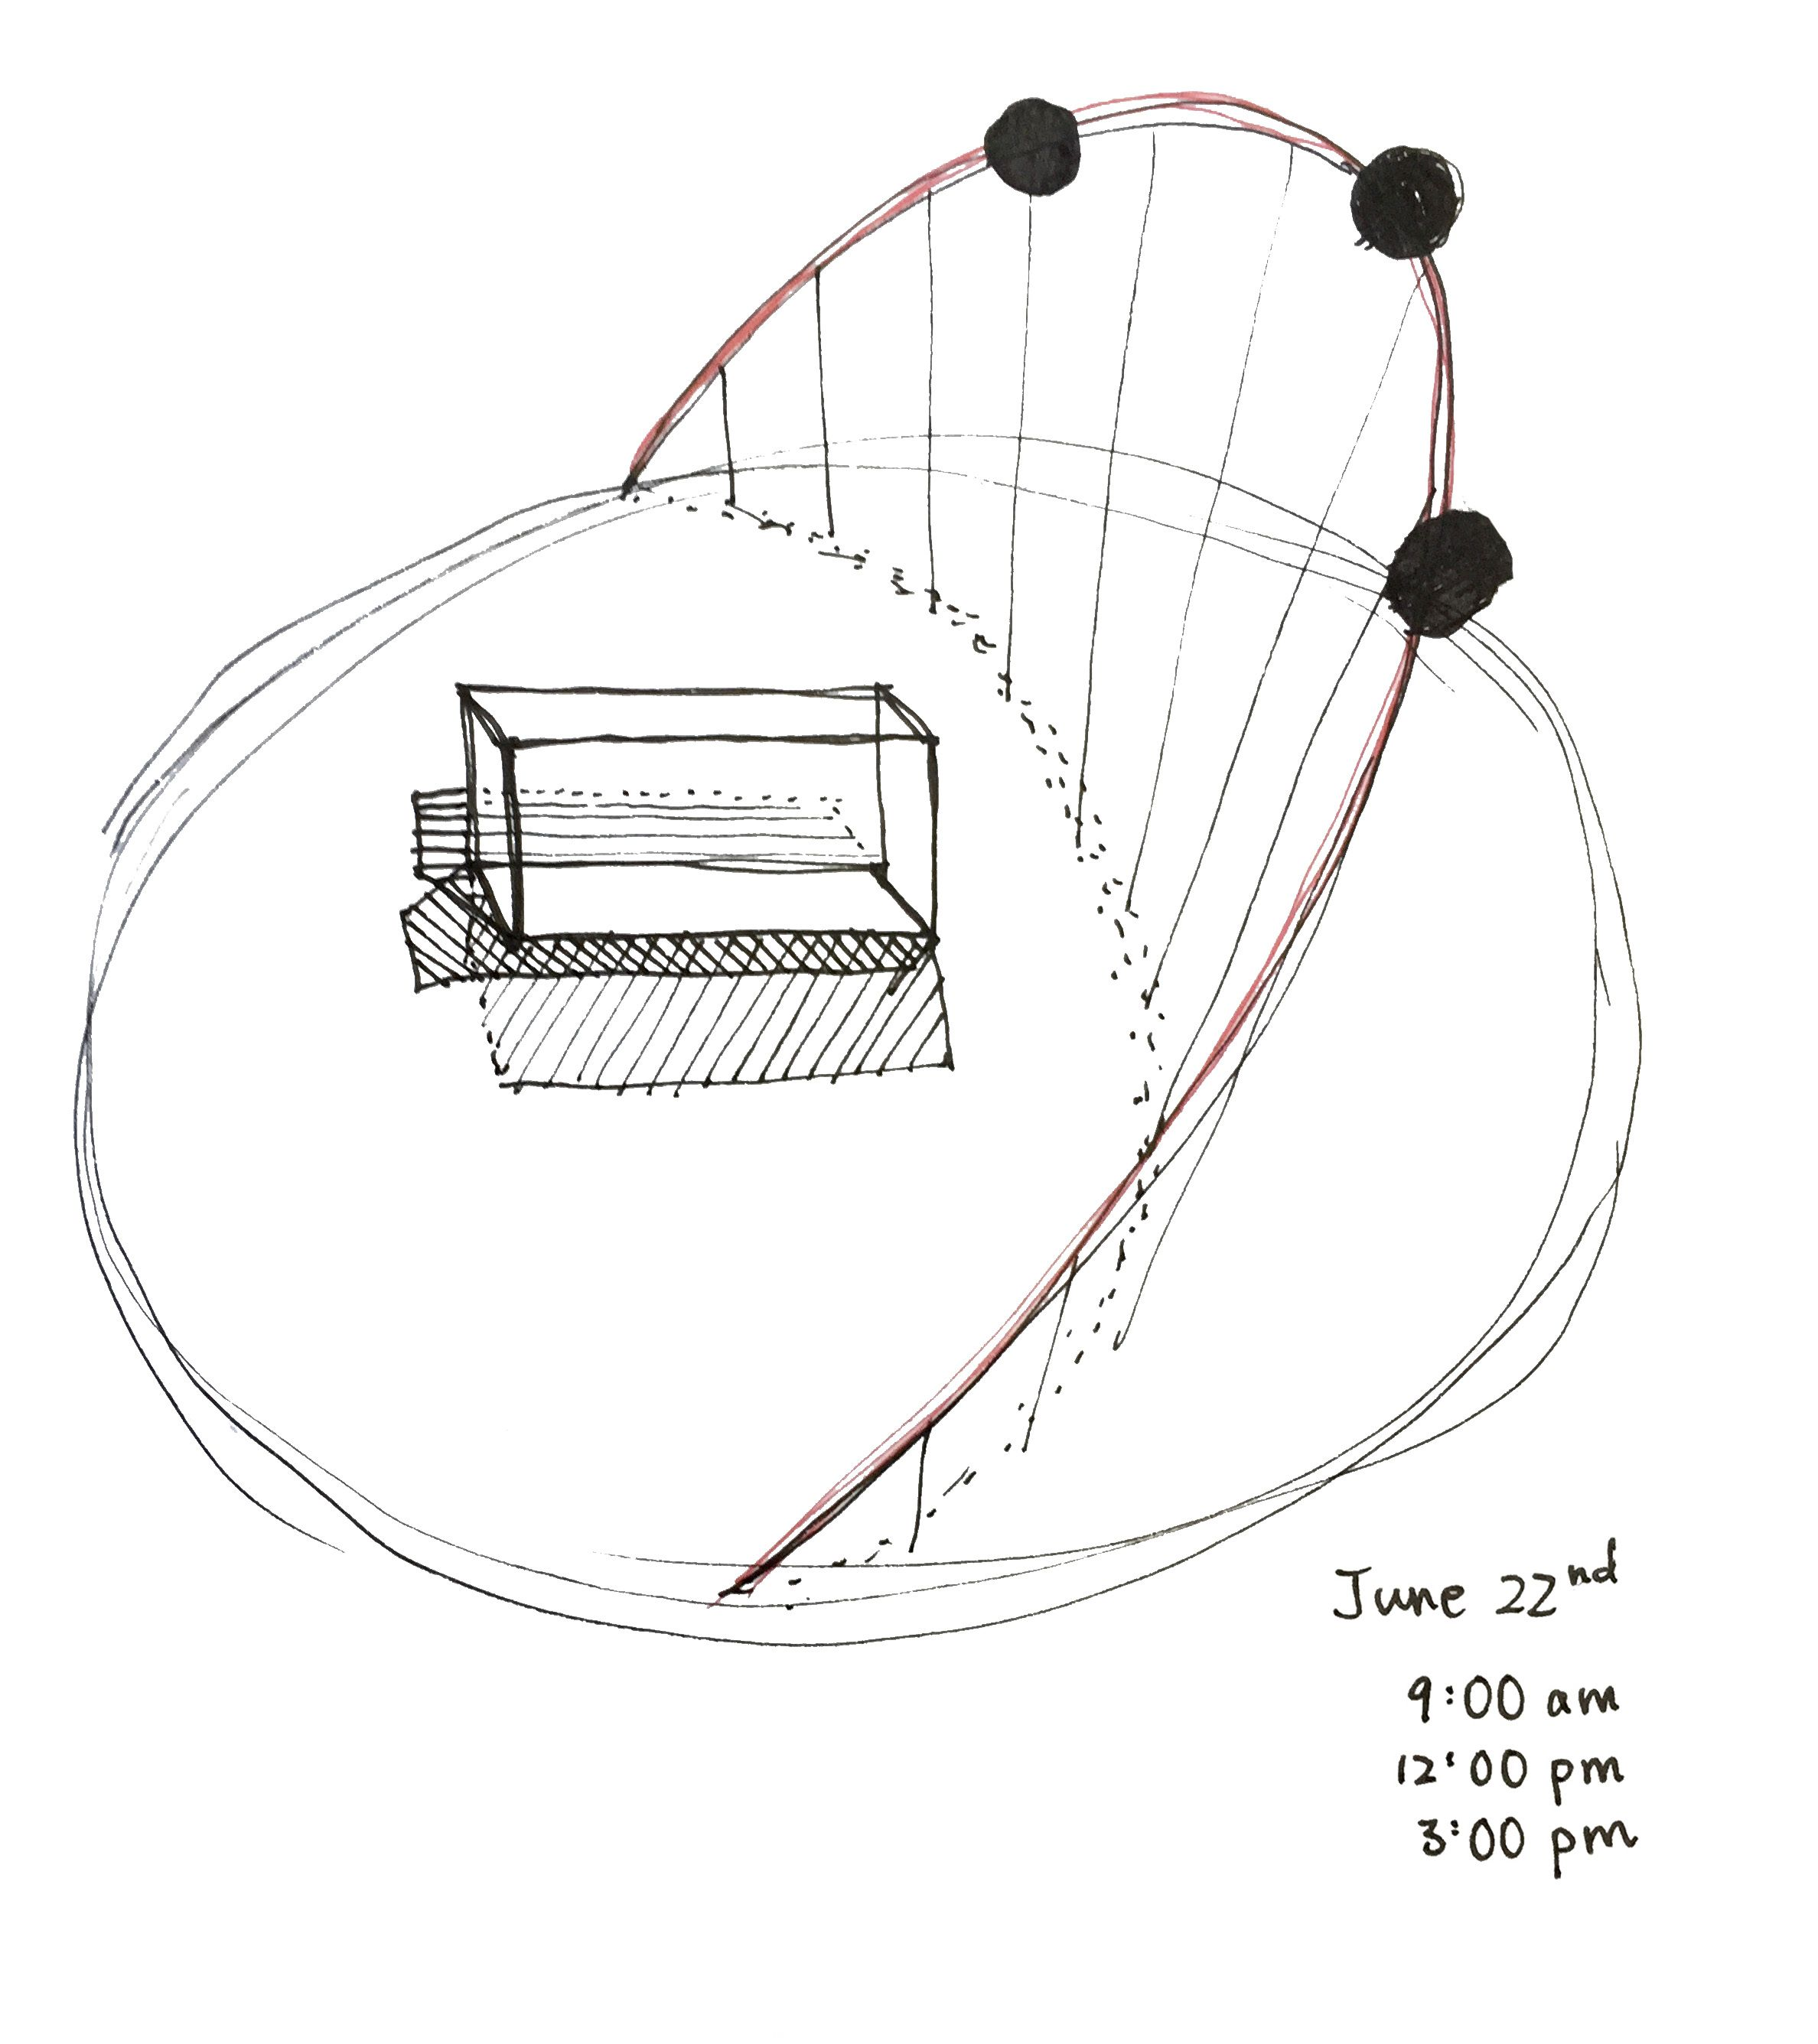 University Of Versailles Science Library Diagram Of Sun Path In June Kellyli 48105 S15 Sun Path Diagram Sun Diagram Diagram Architecture